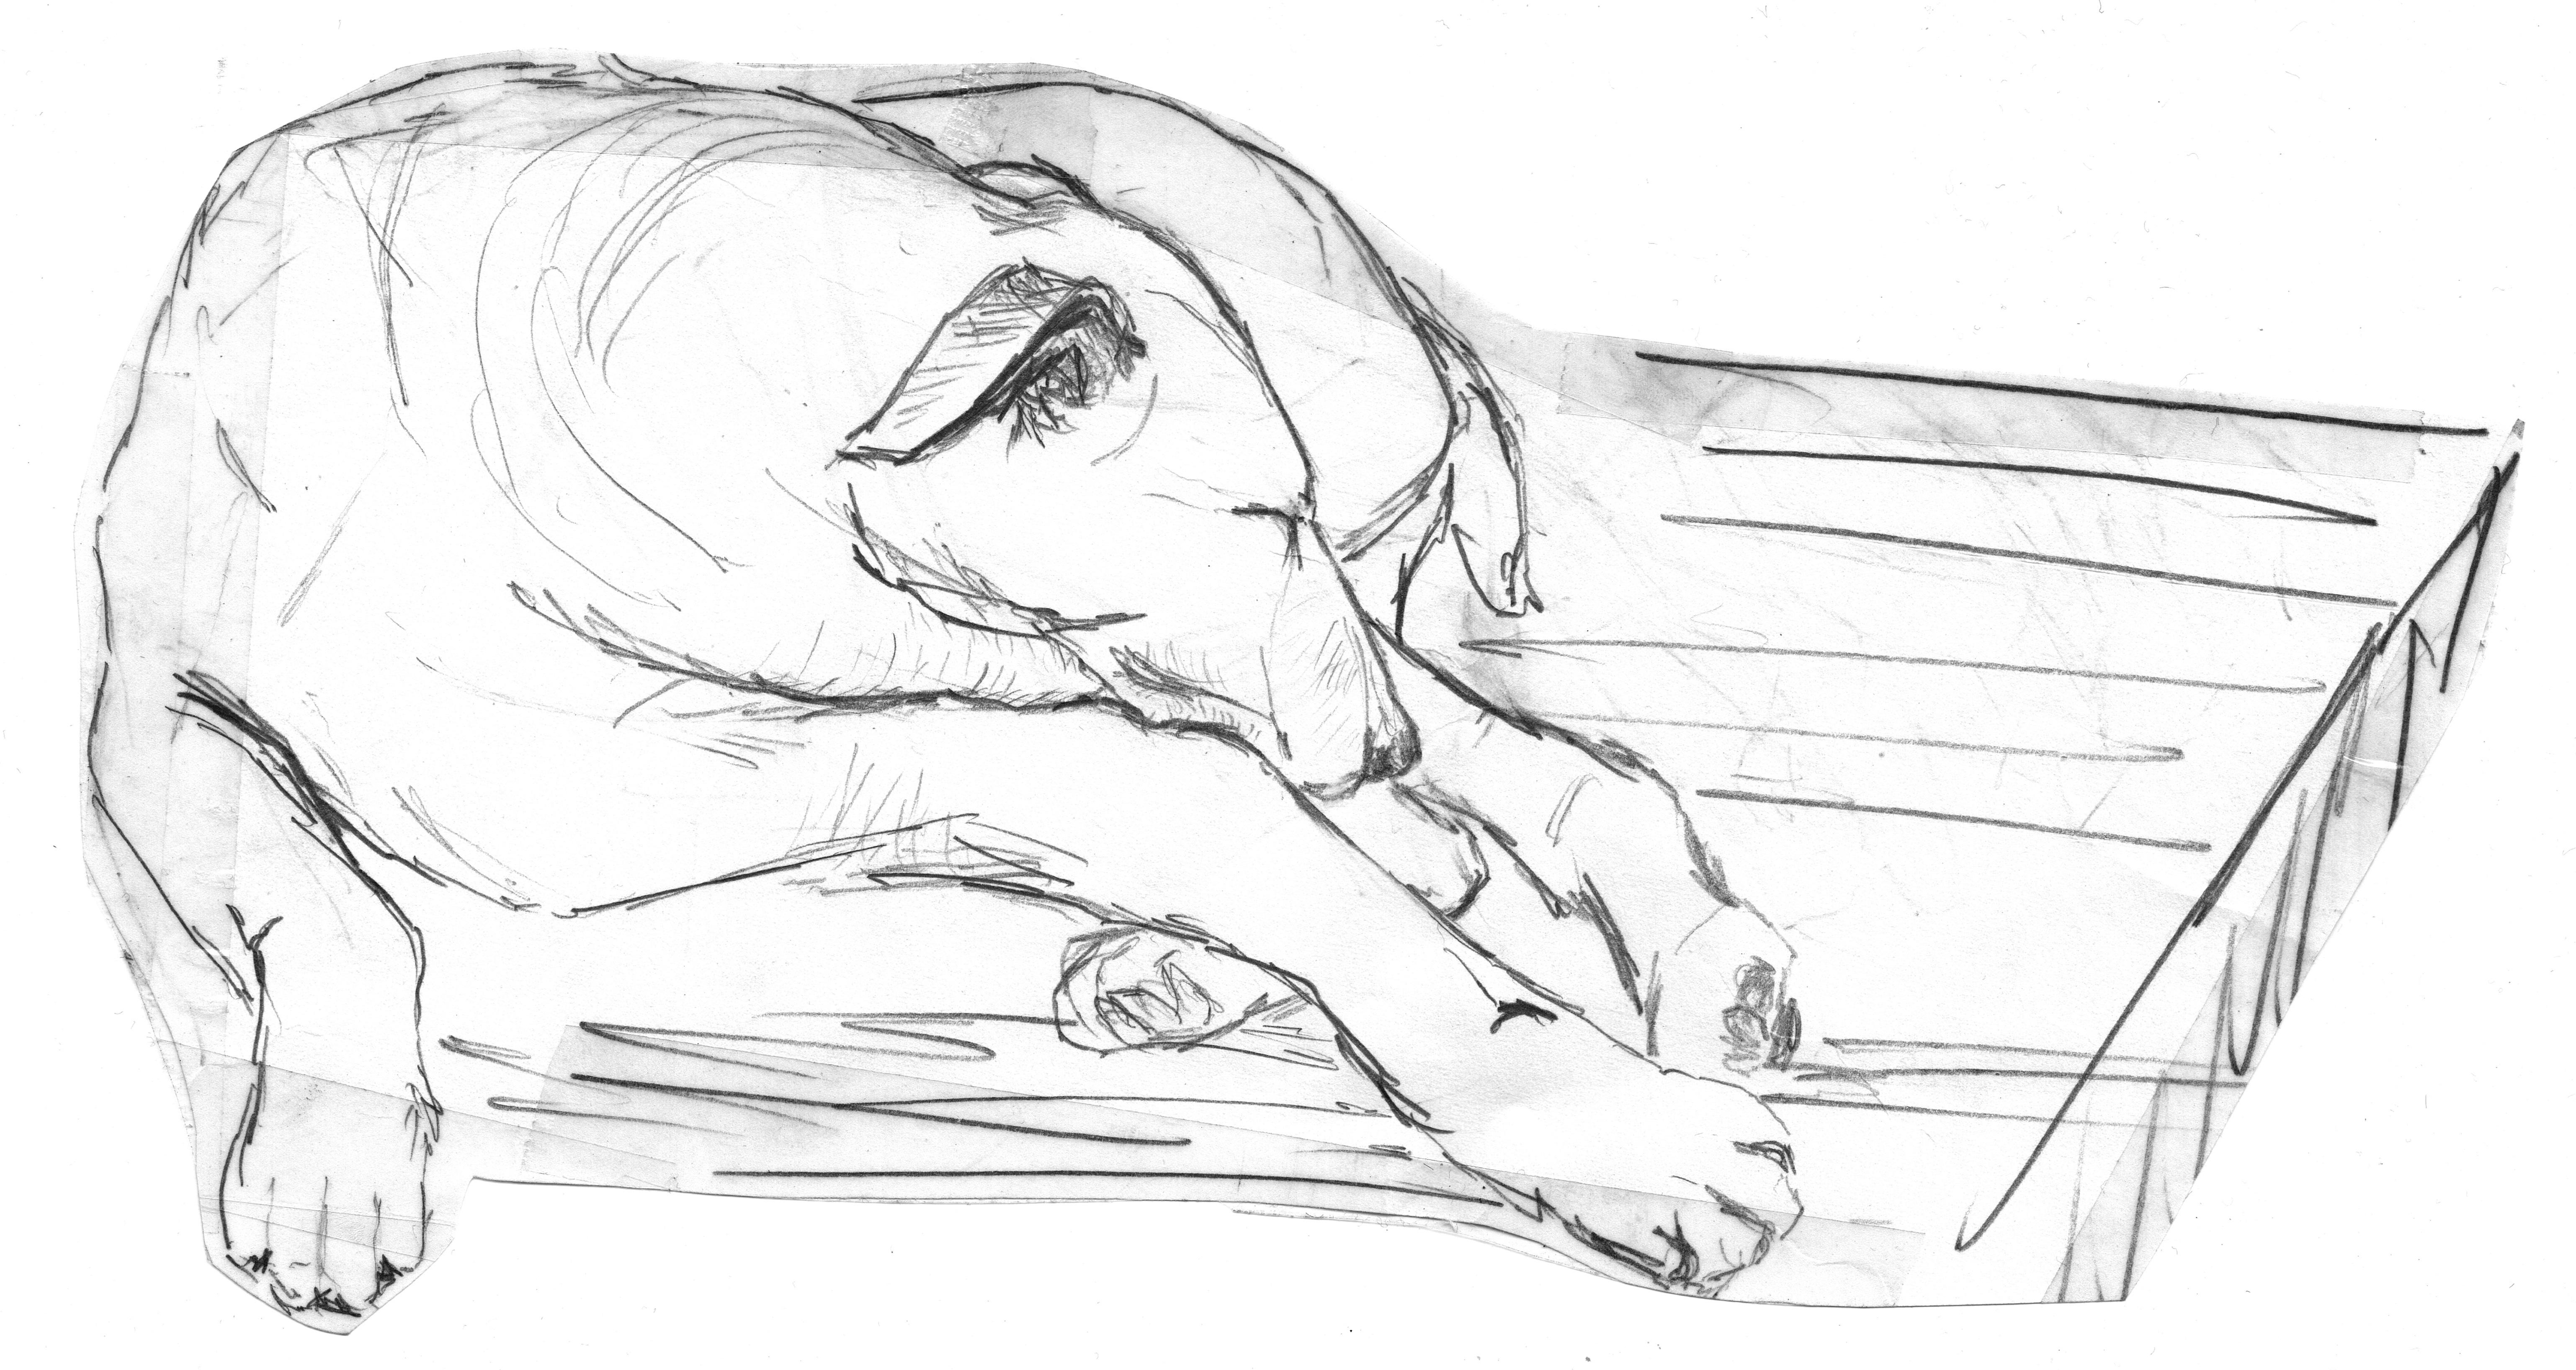 Black and white dog animal pet artwork sleep sketch drawing illustration lying pencil drawing doze sleeping